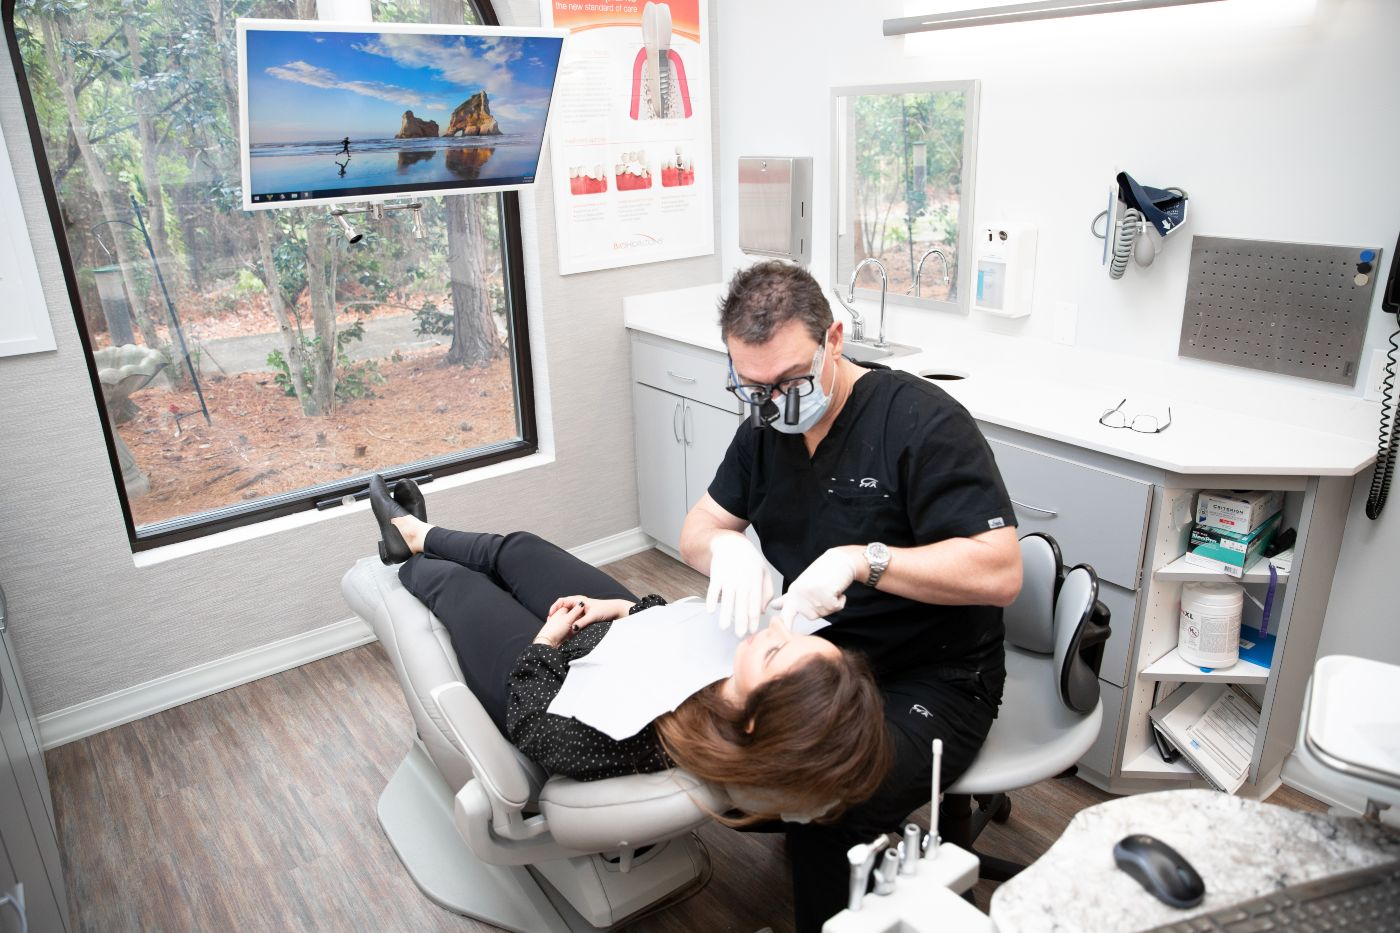 Dr. Schof working on patient in Mandeville